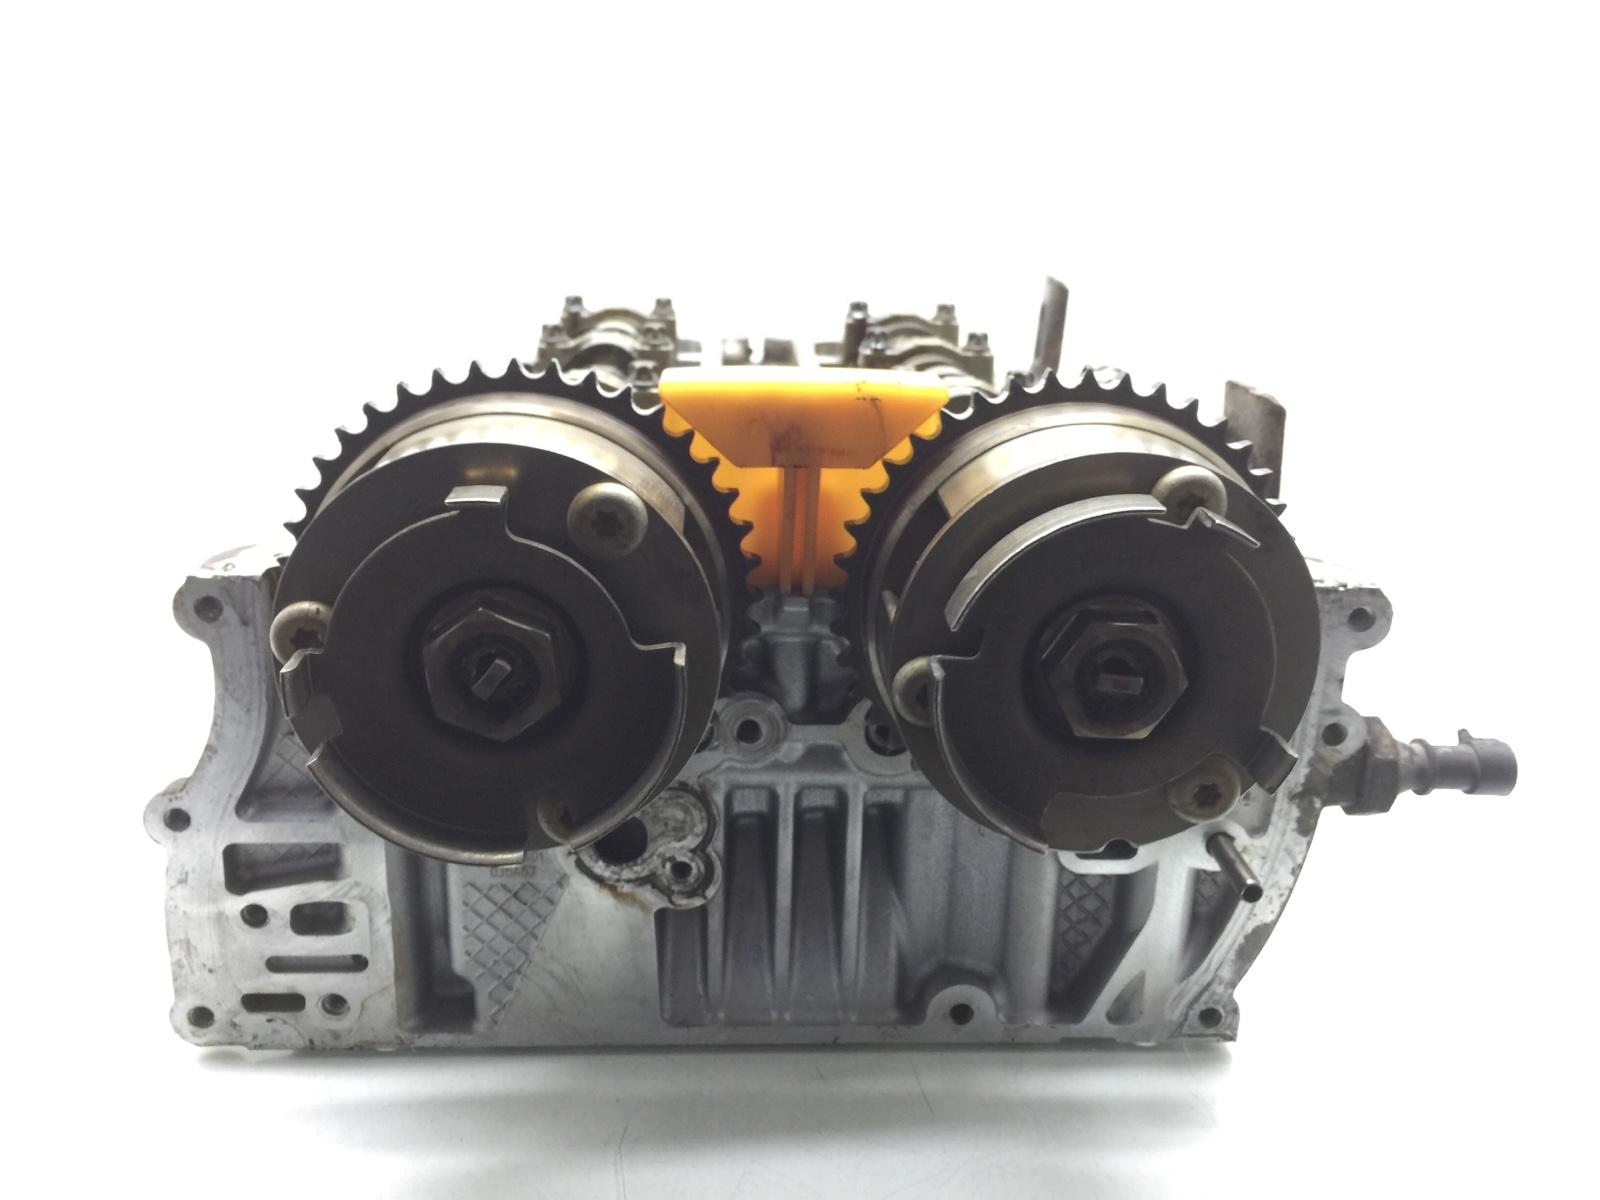 Головка блока цилиндров Opel Corsa D 1.2 I 2011 (б/у)